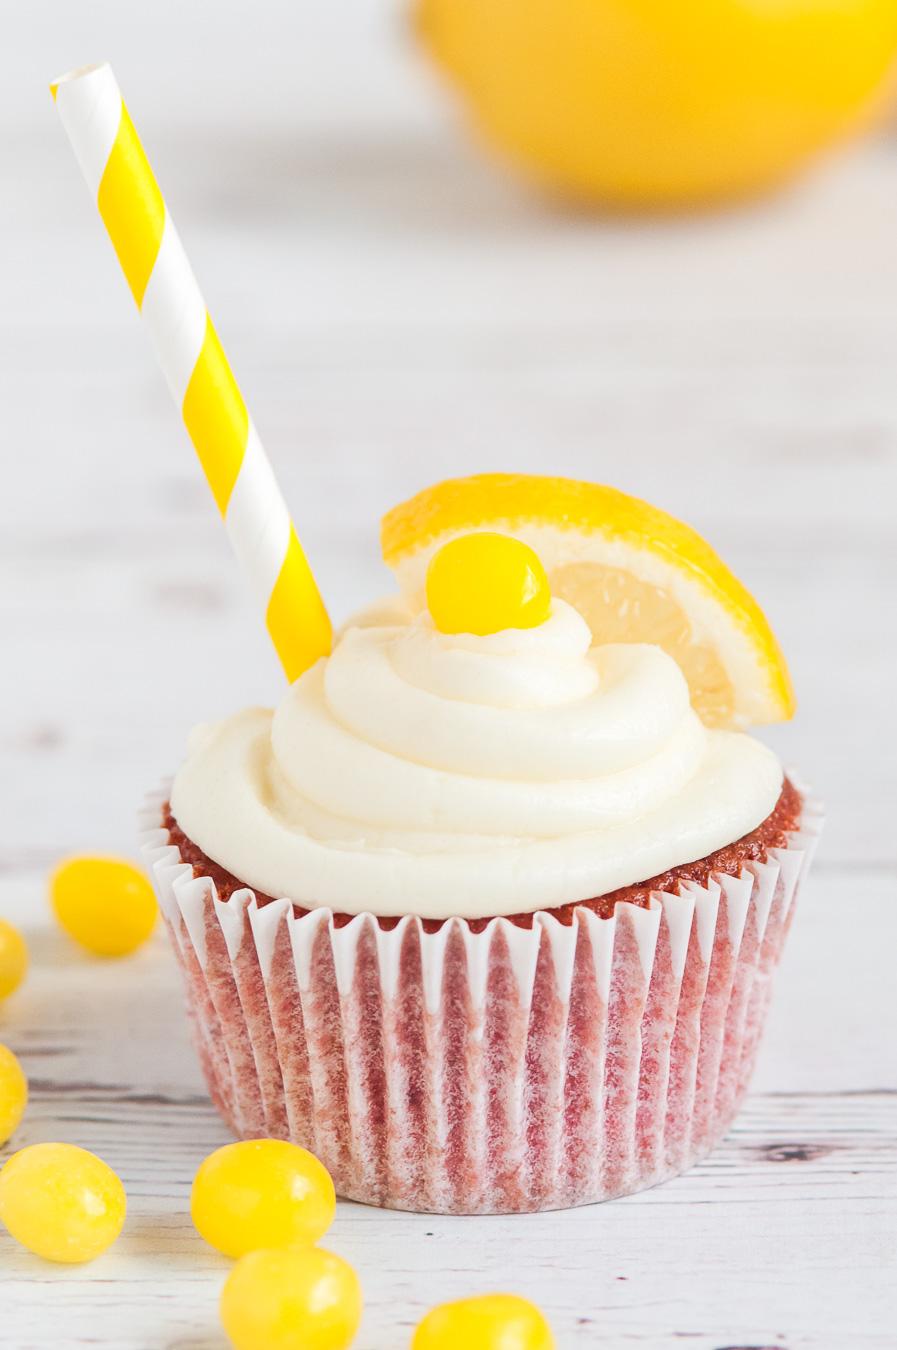 lemonade cupcake with lemonhead garnish